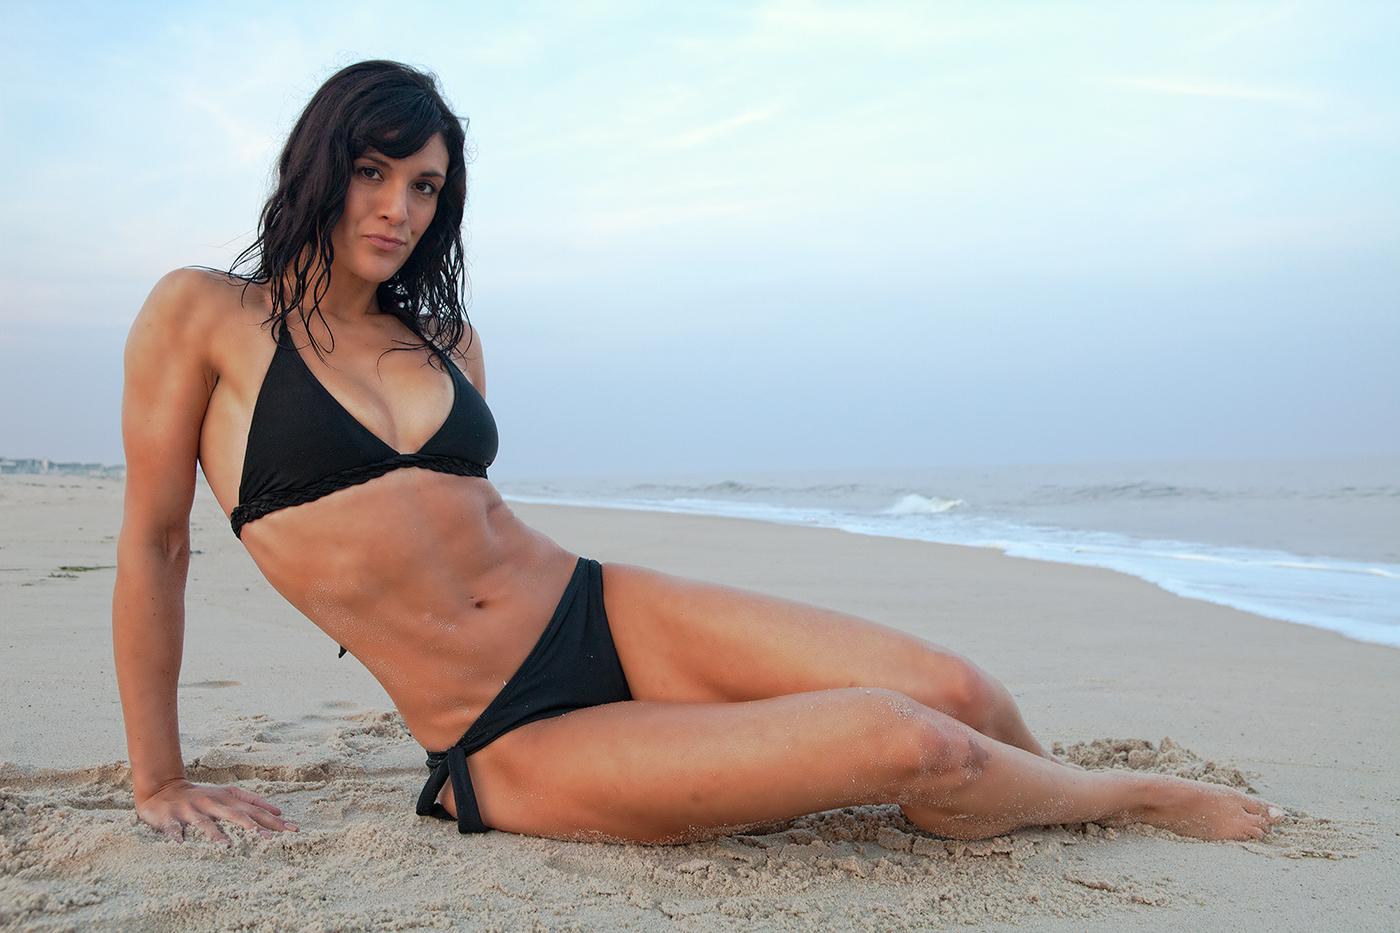 Swimsuit_RichDodgePhotography_Portrait.jpg